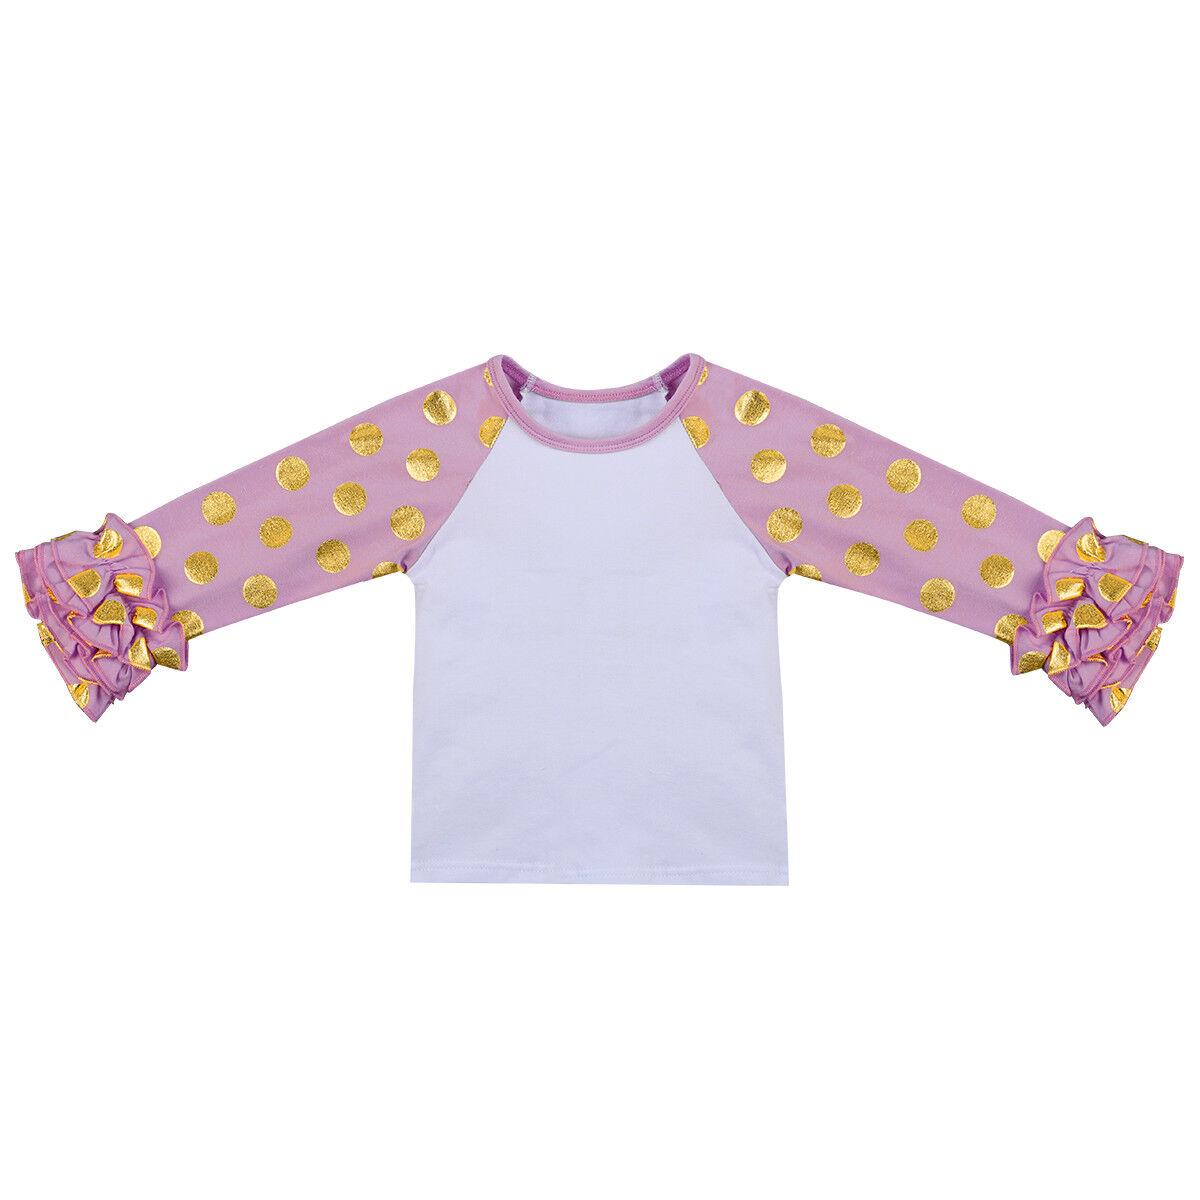 1b93612f7f4 Toddler Kids Baby Girls Icing Raglan Ruffle Dot Shirt Baseball Blank ...